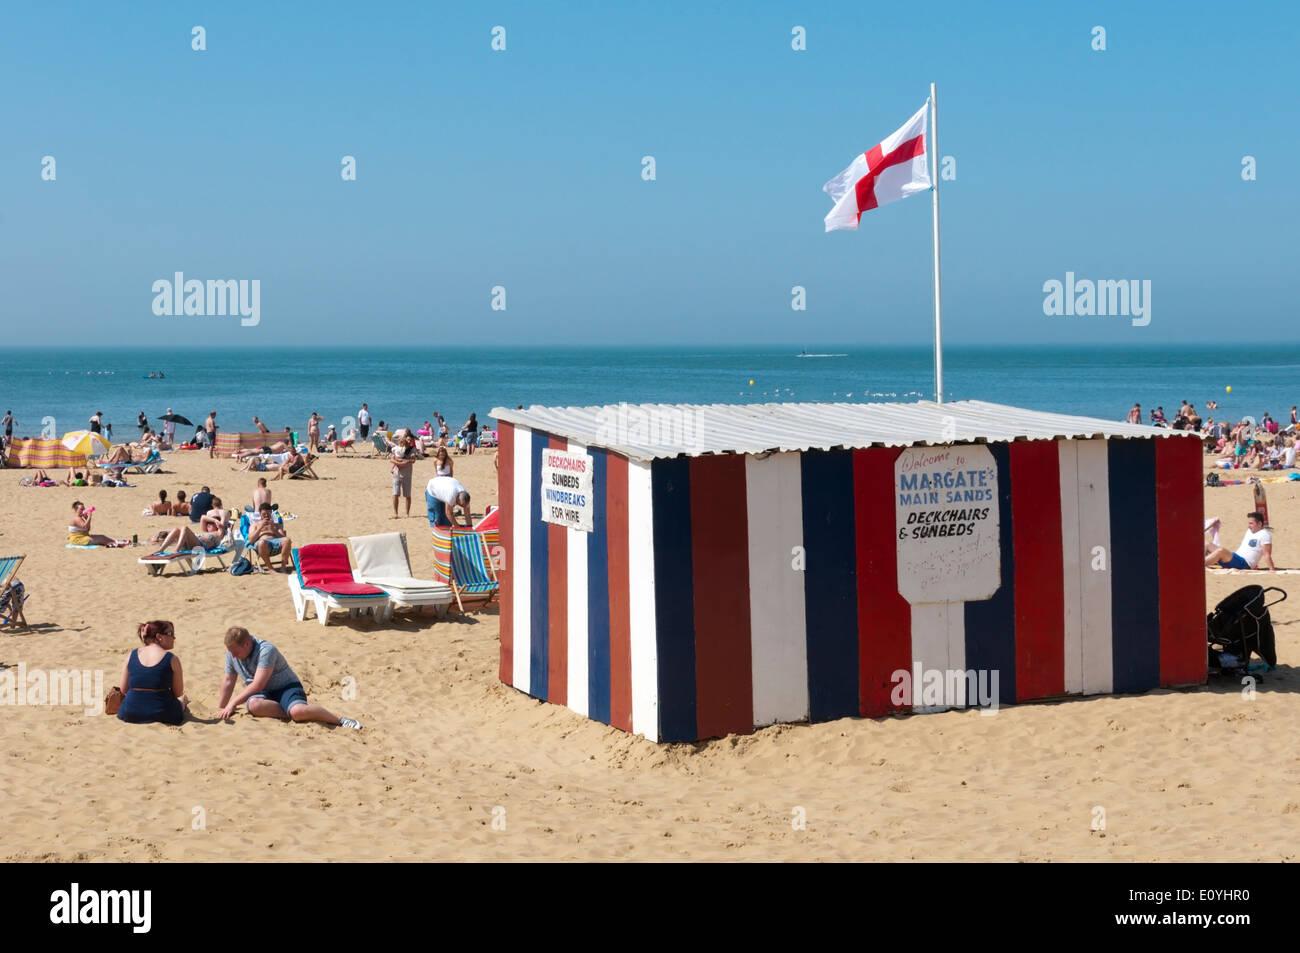 Deckchair hire on Margate beach, Kent. - Stock Image